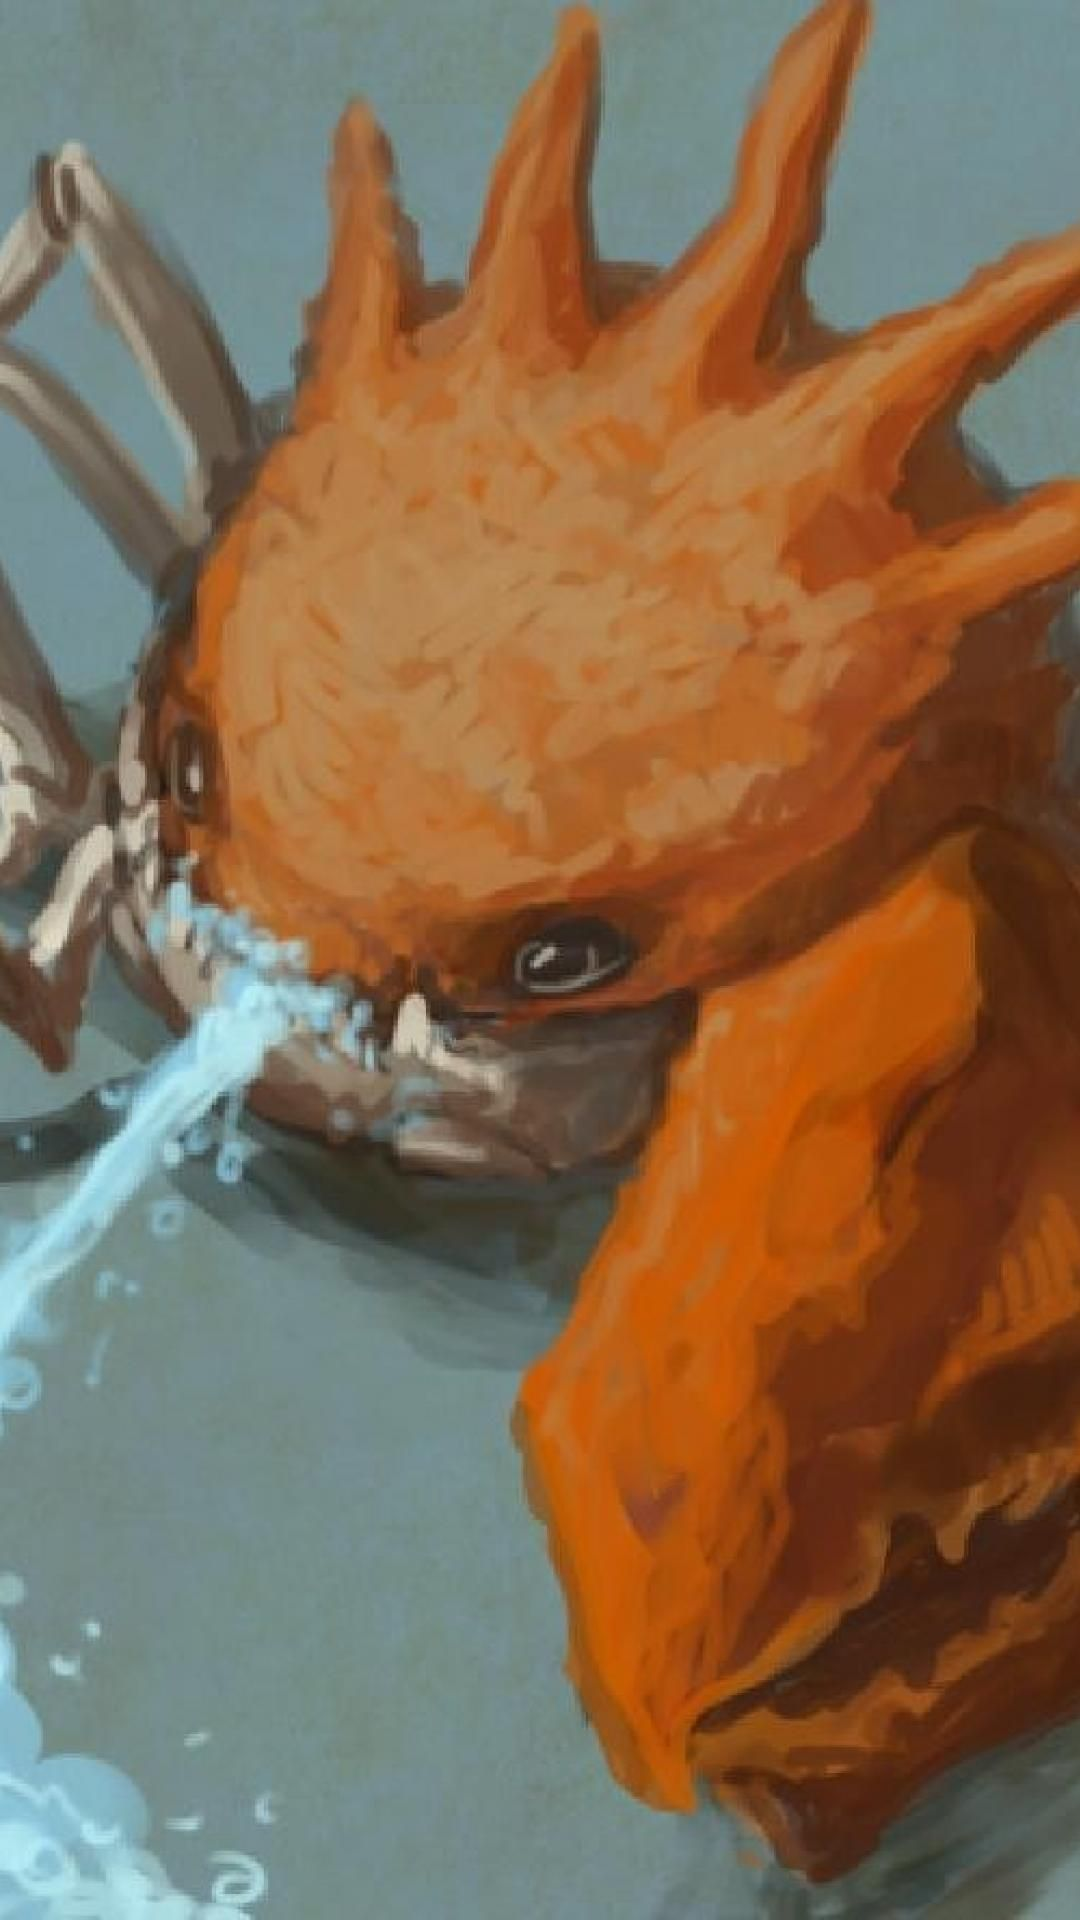 Water pokemon digital art artwork crabs kingler wallpaper   (102865)